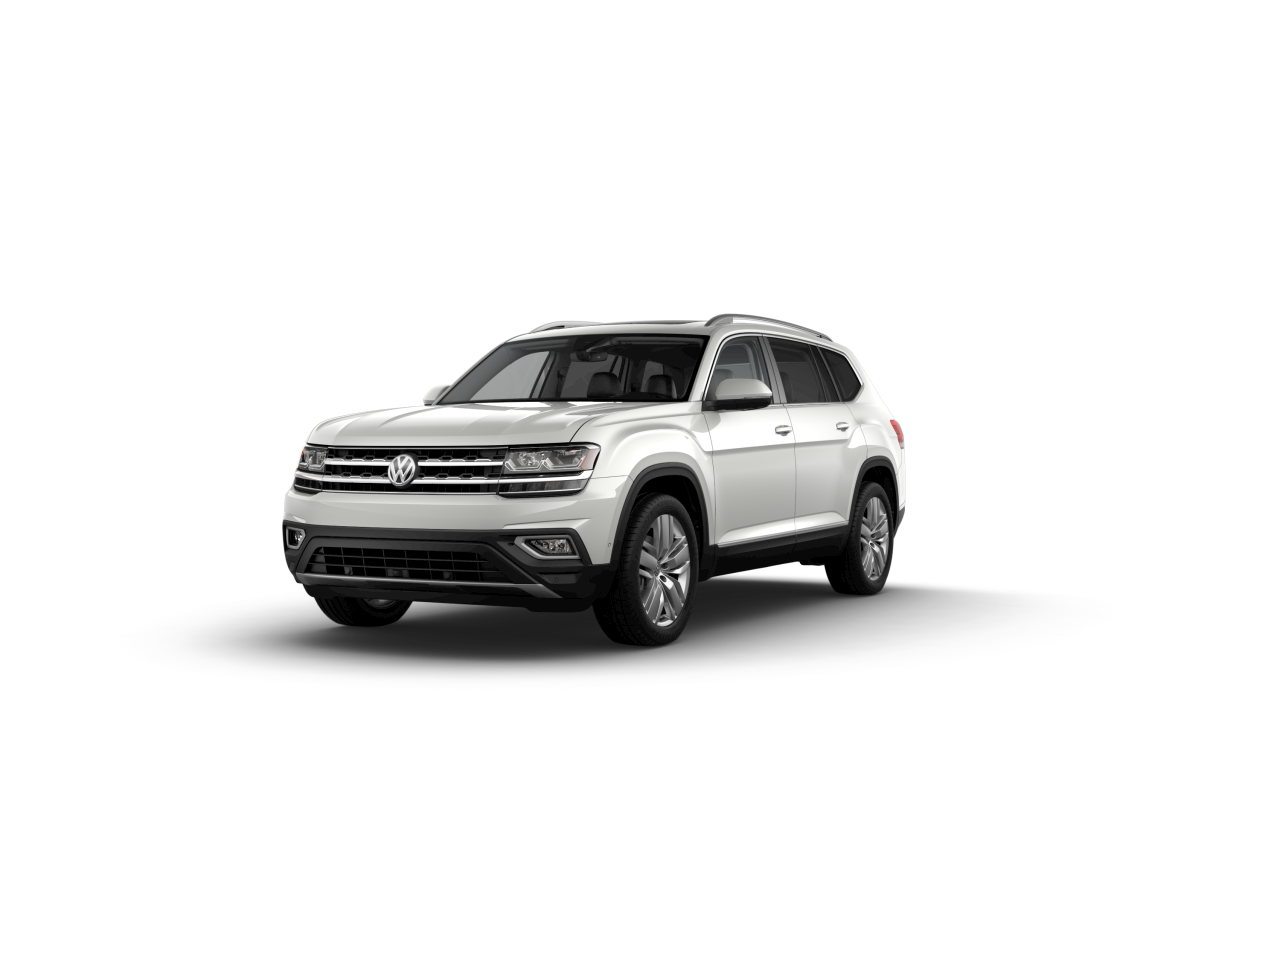 2019 VW Atlas midsize family SUV Volkswagen Latest